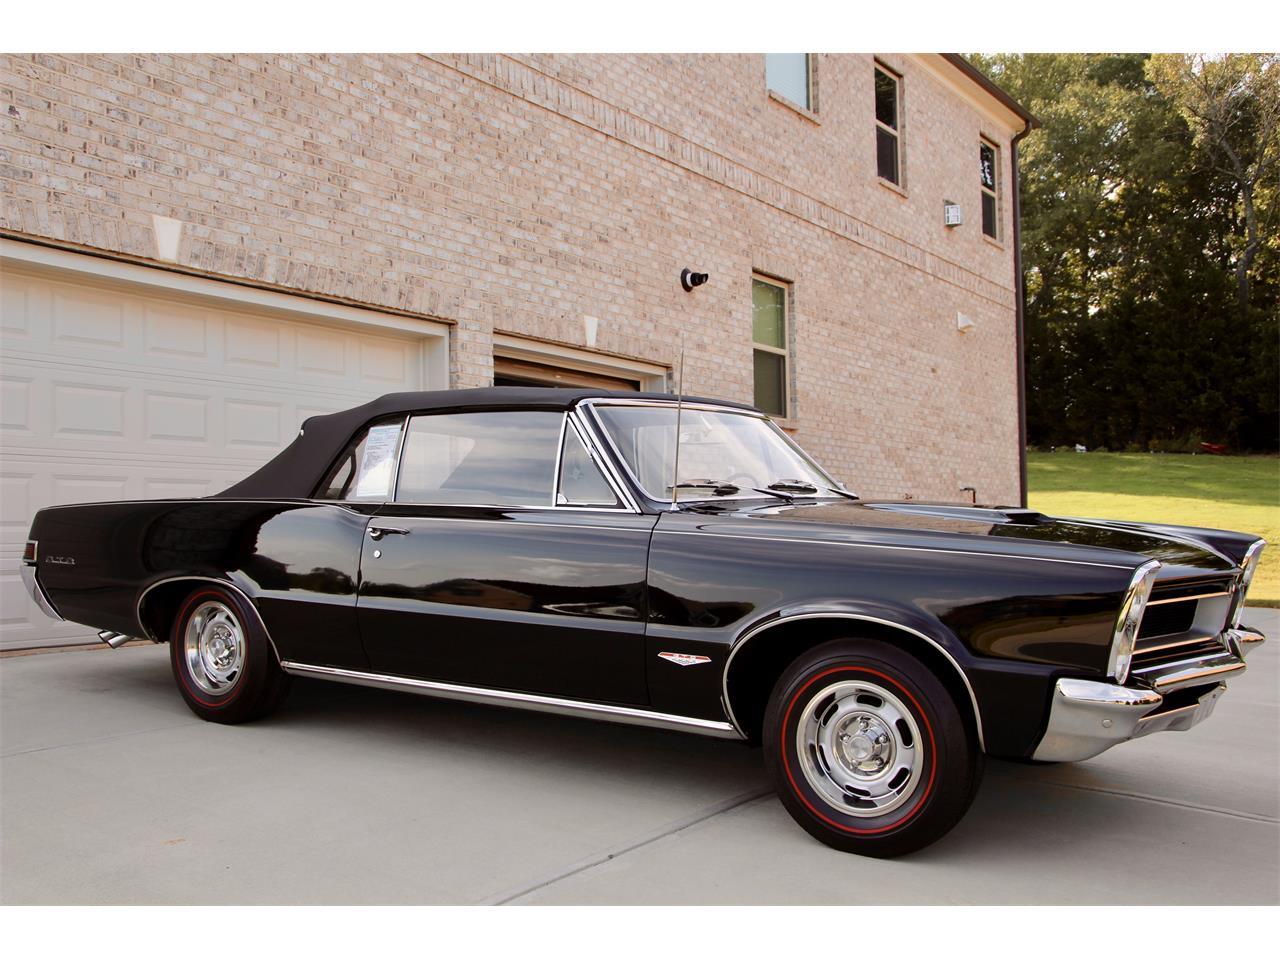 1965 Pontiac Gto For Sale In Greer Sc Classiccarsbay Com